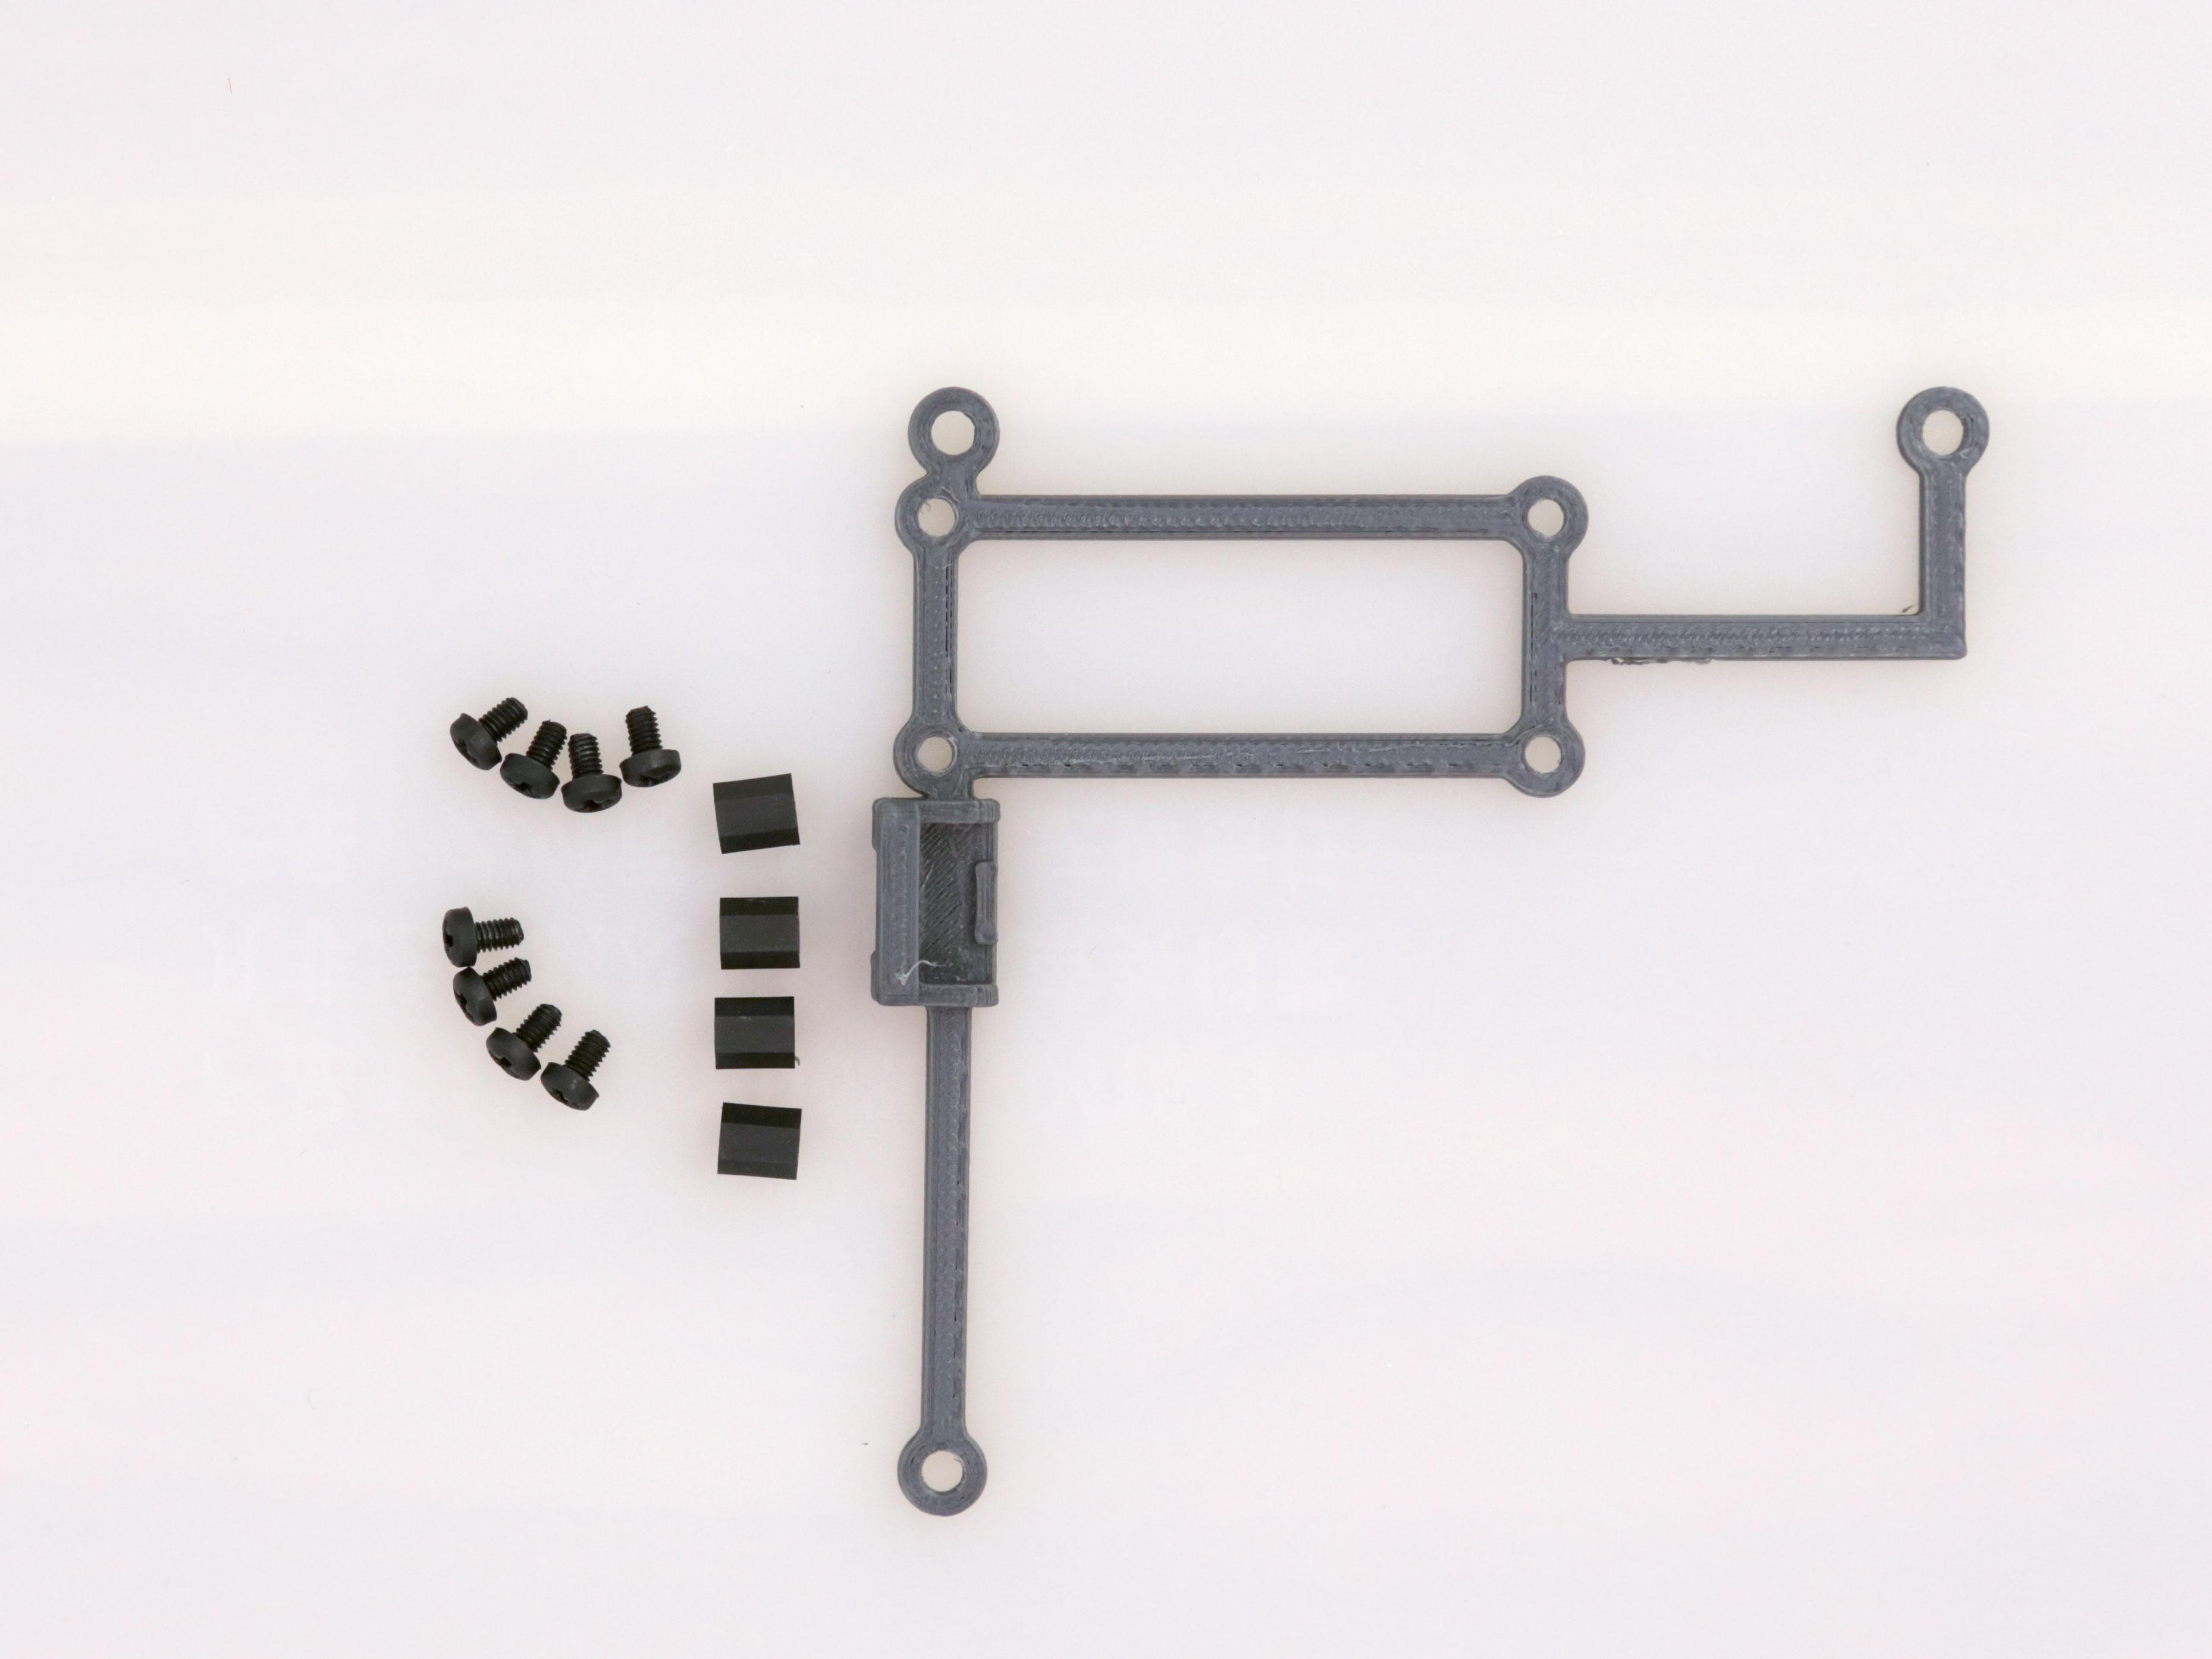 led_strips_pcb-screws.jpg